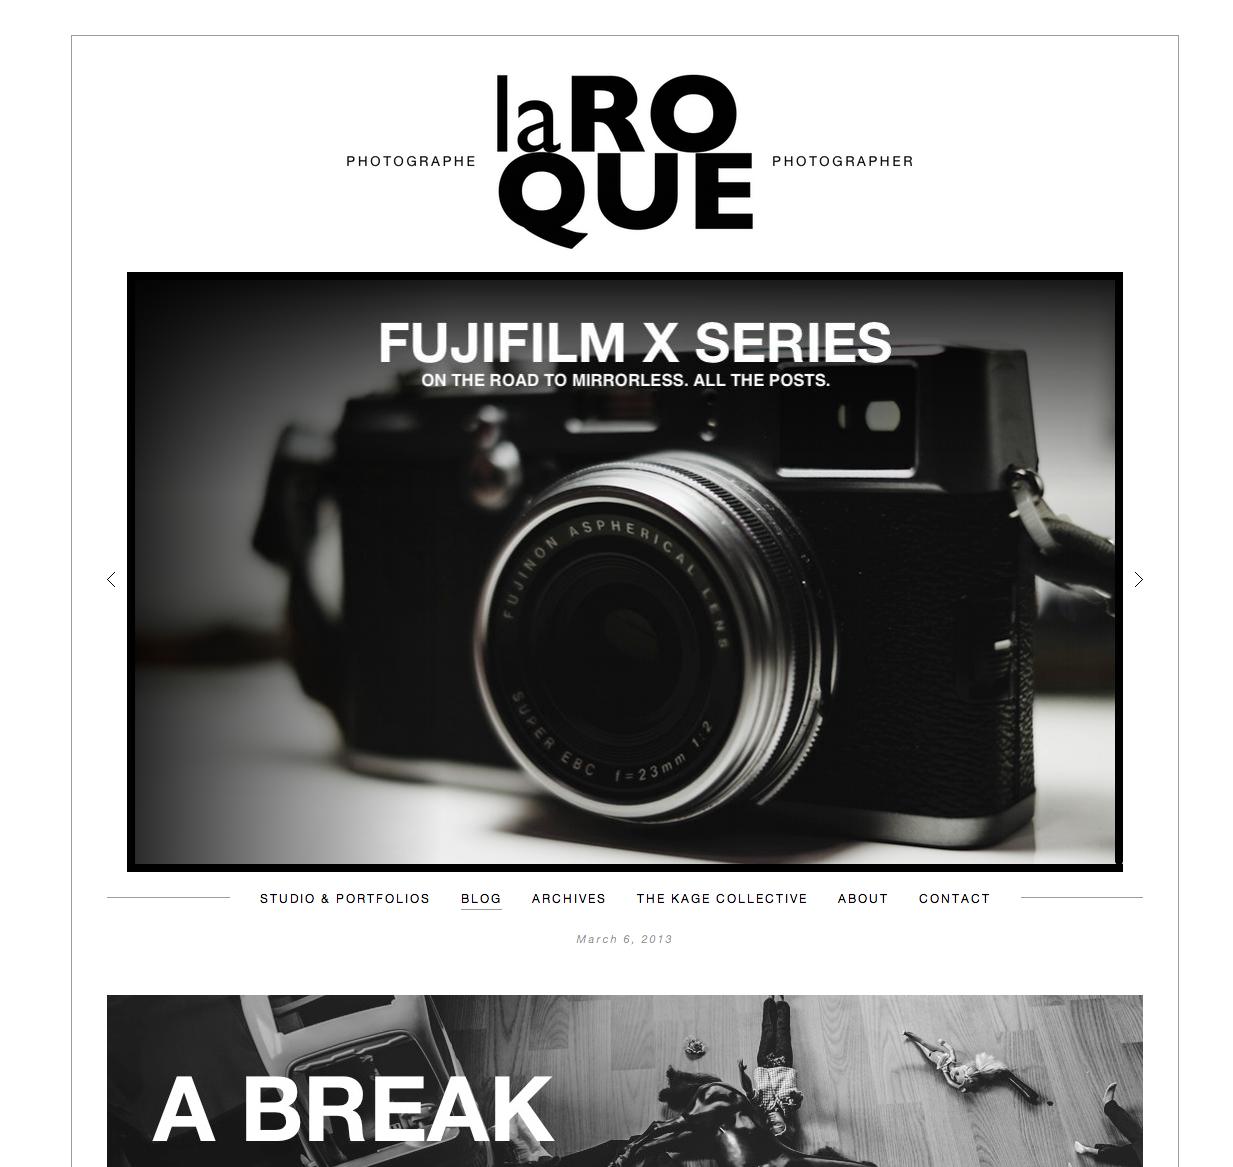 laROQUE Blog